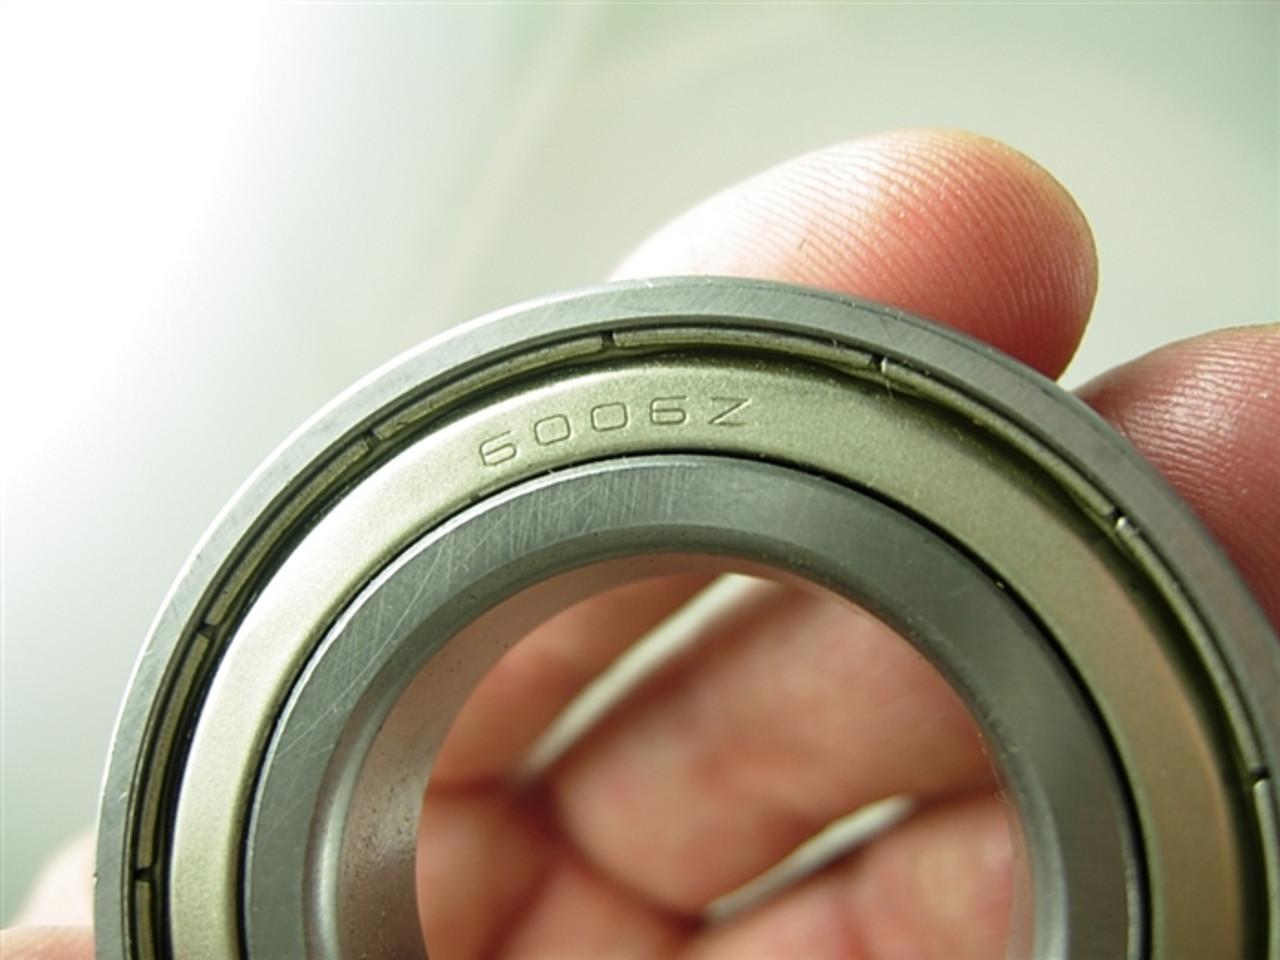 bearing 11125-a63-9